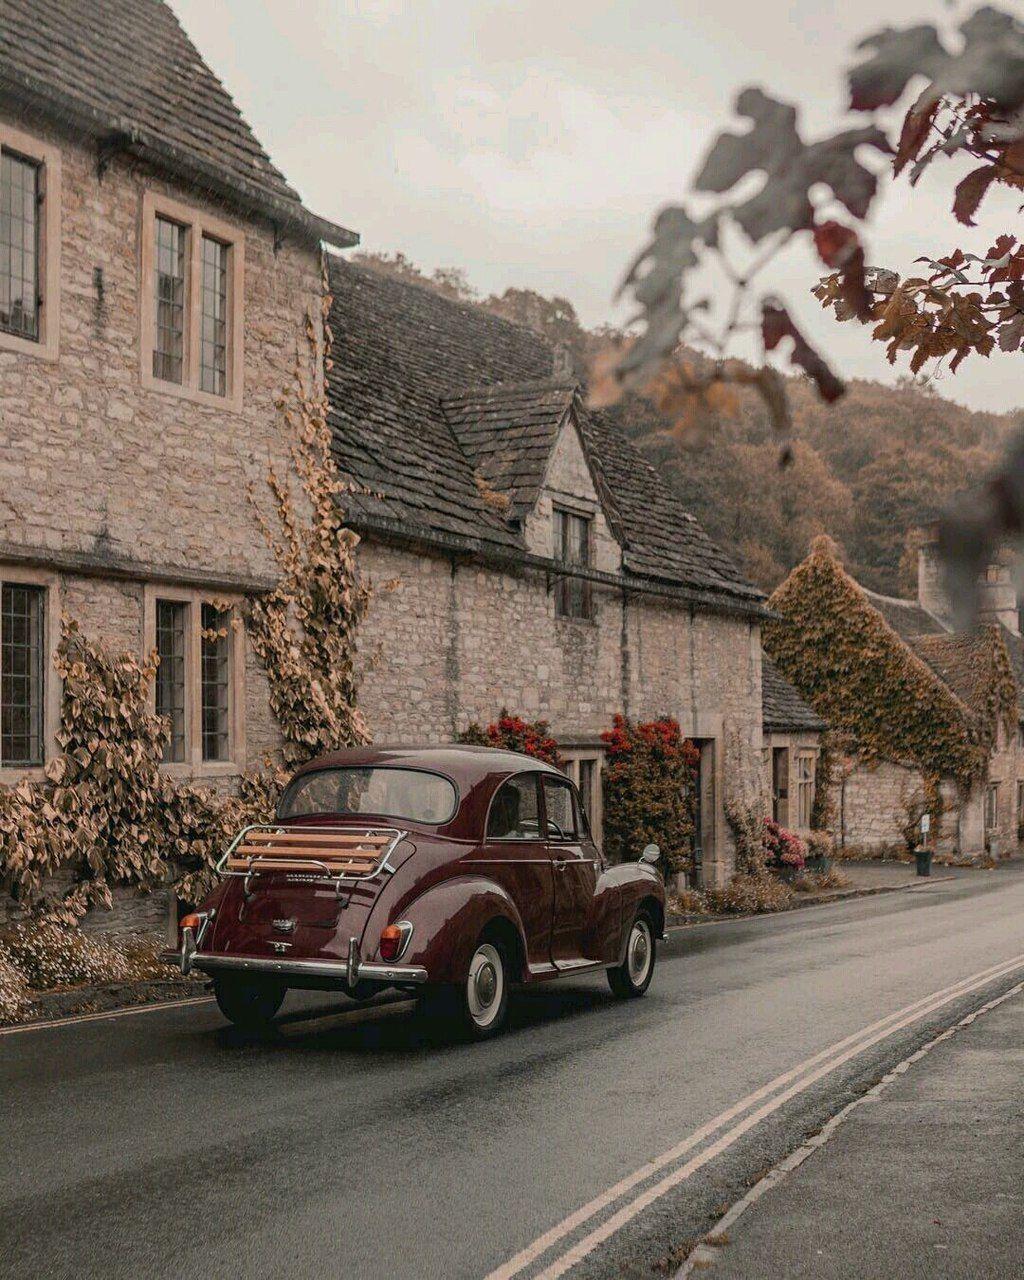 England, The United Kingdom uploaded by Emma Fane